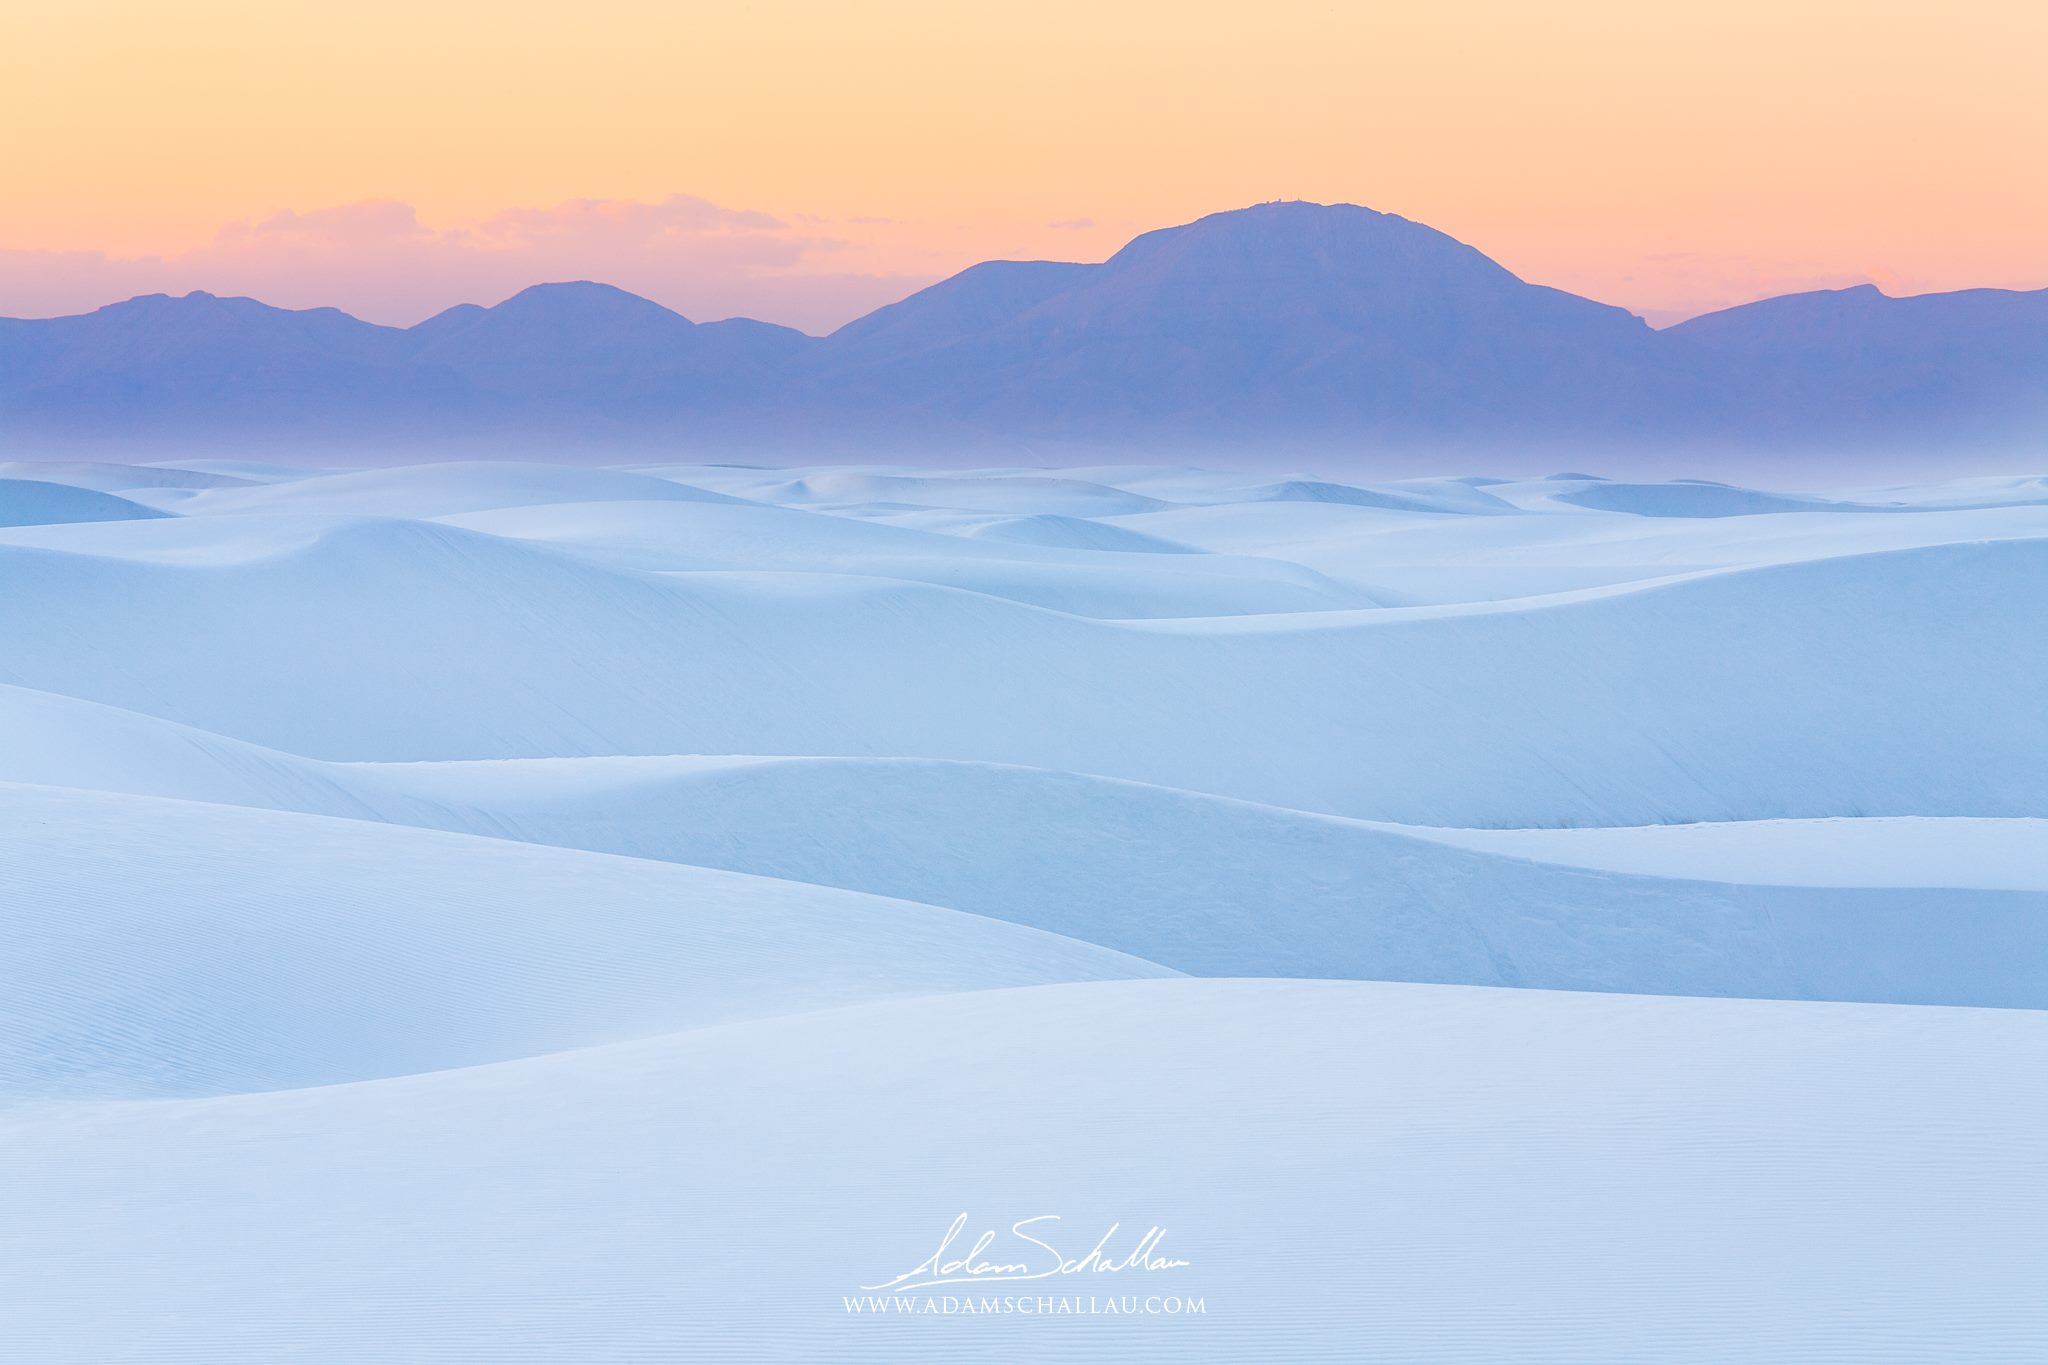 Landscape Photography by Adam Shallau